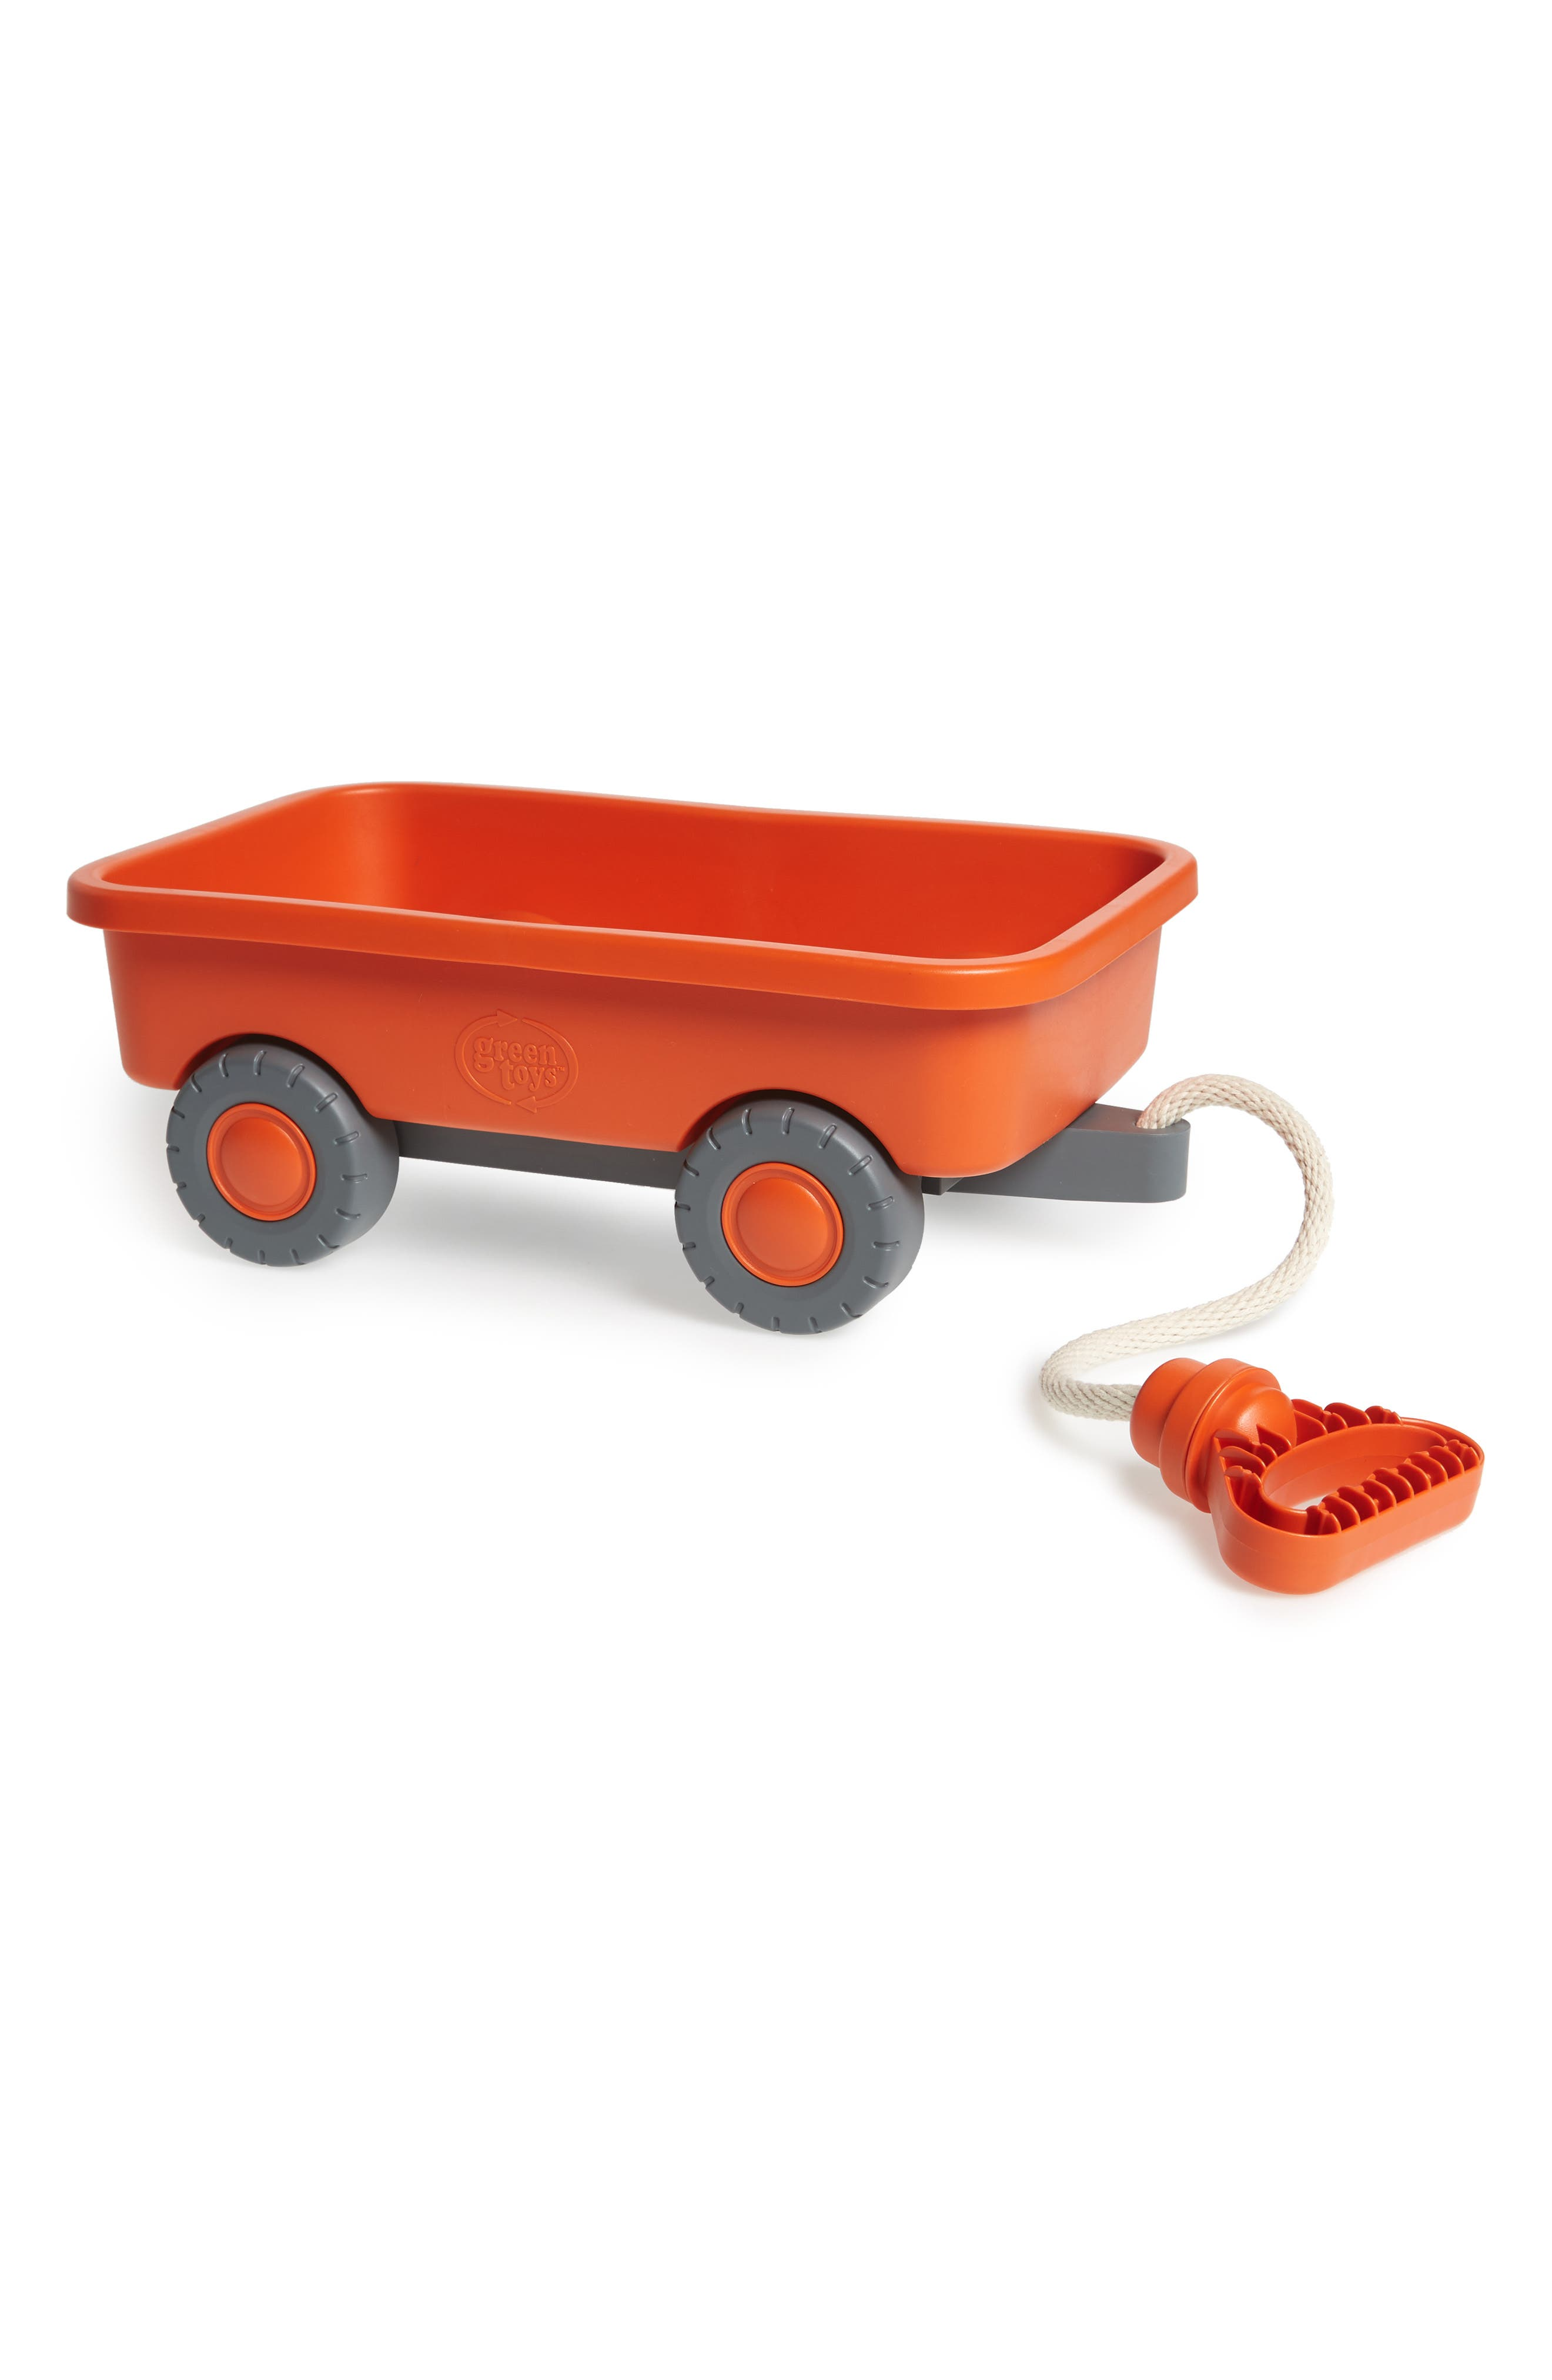 Green Toys Orange Recycled Plastic Wagon